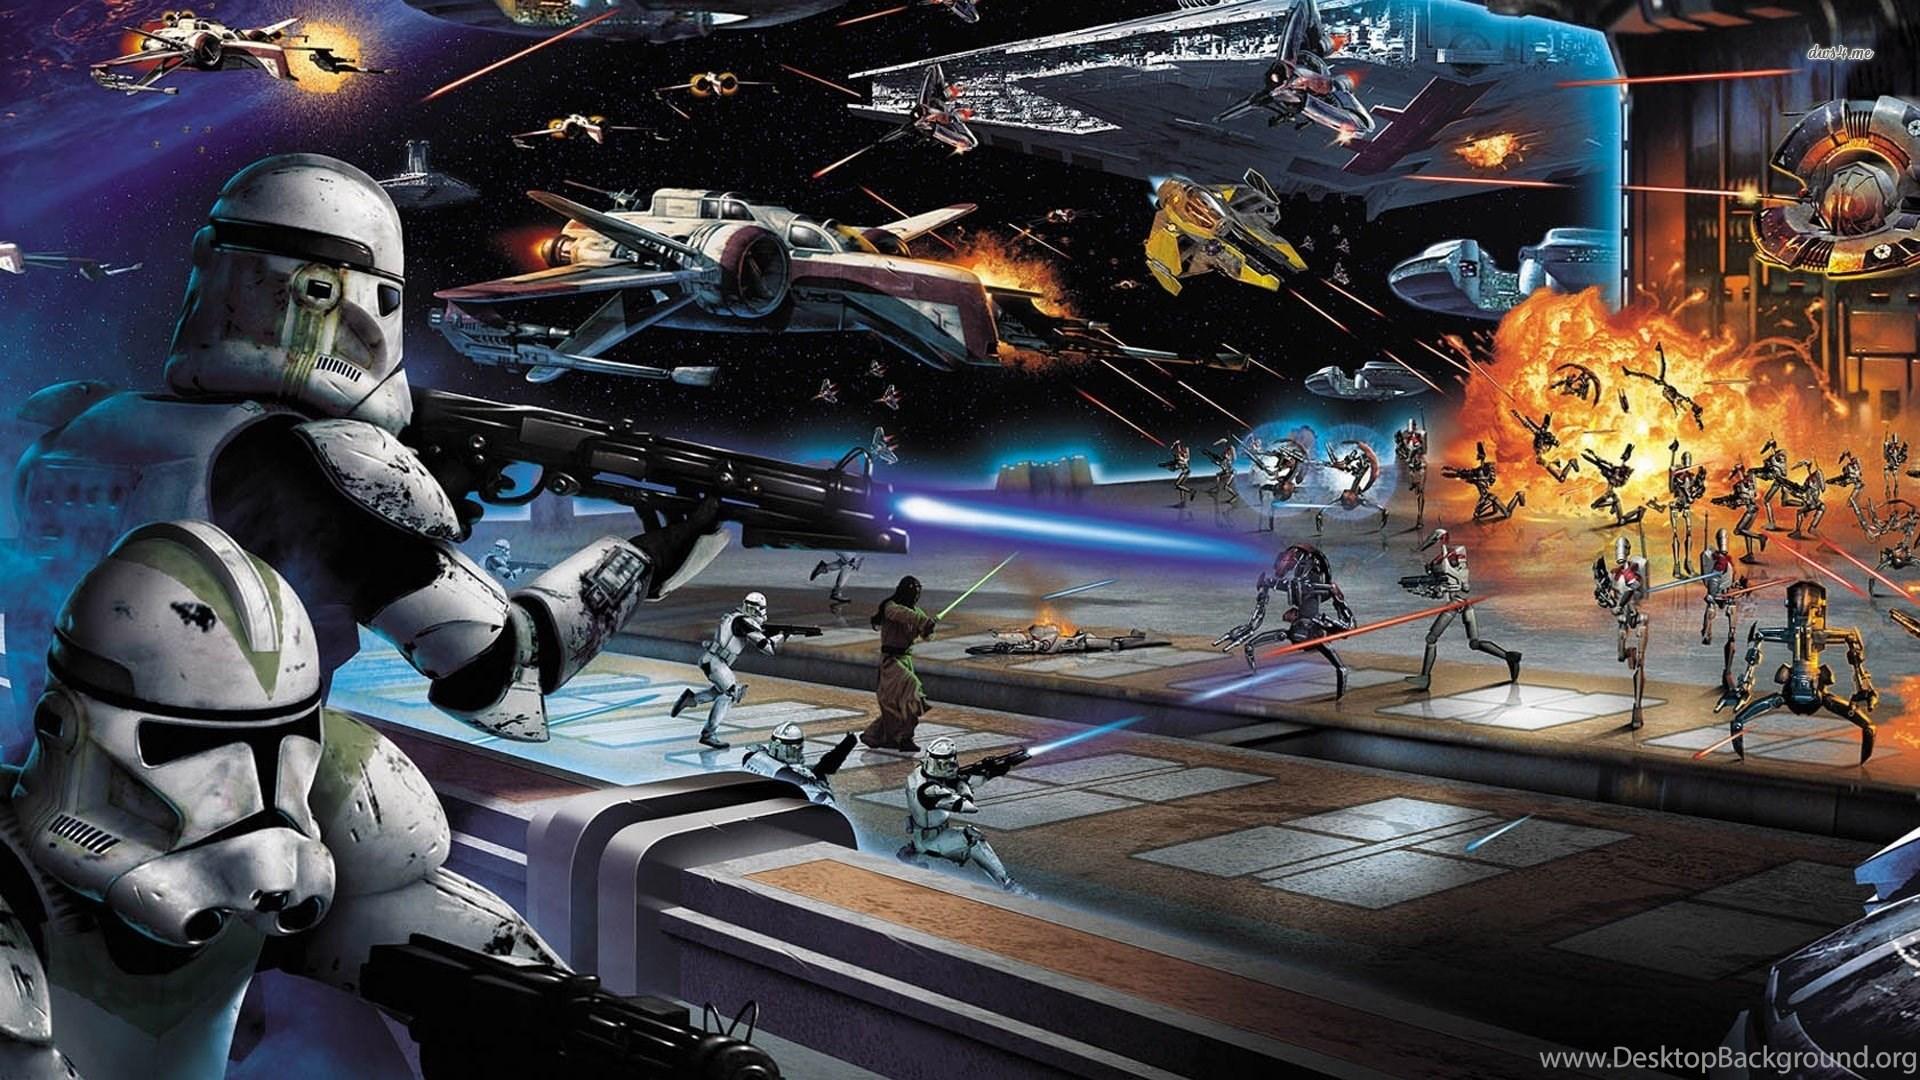 Top Hd Star Wars Battlefront 2 Wallpapers Desktop Background